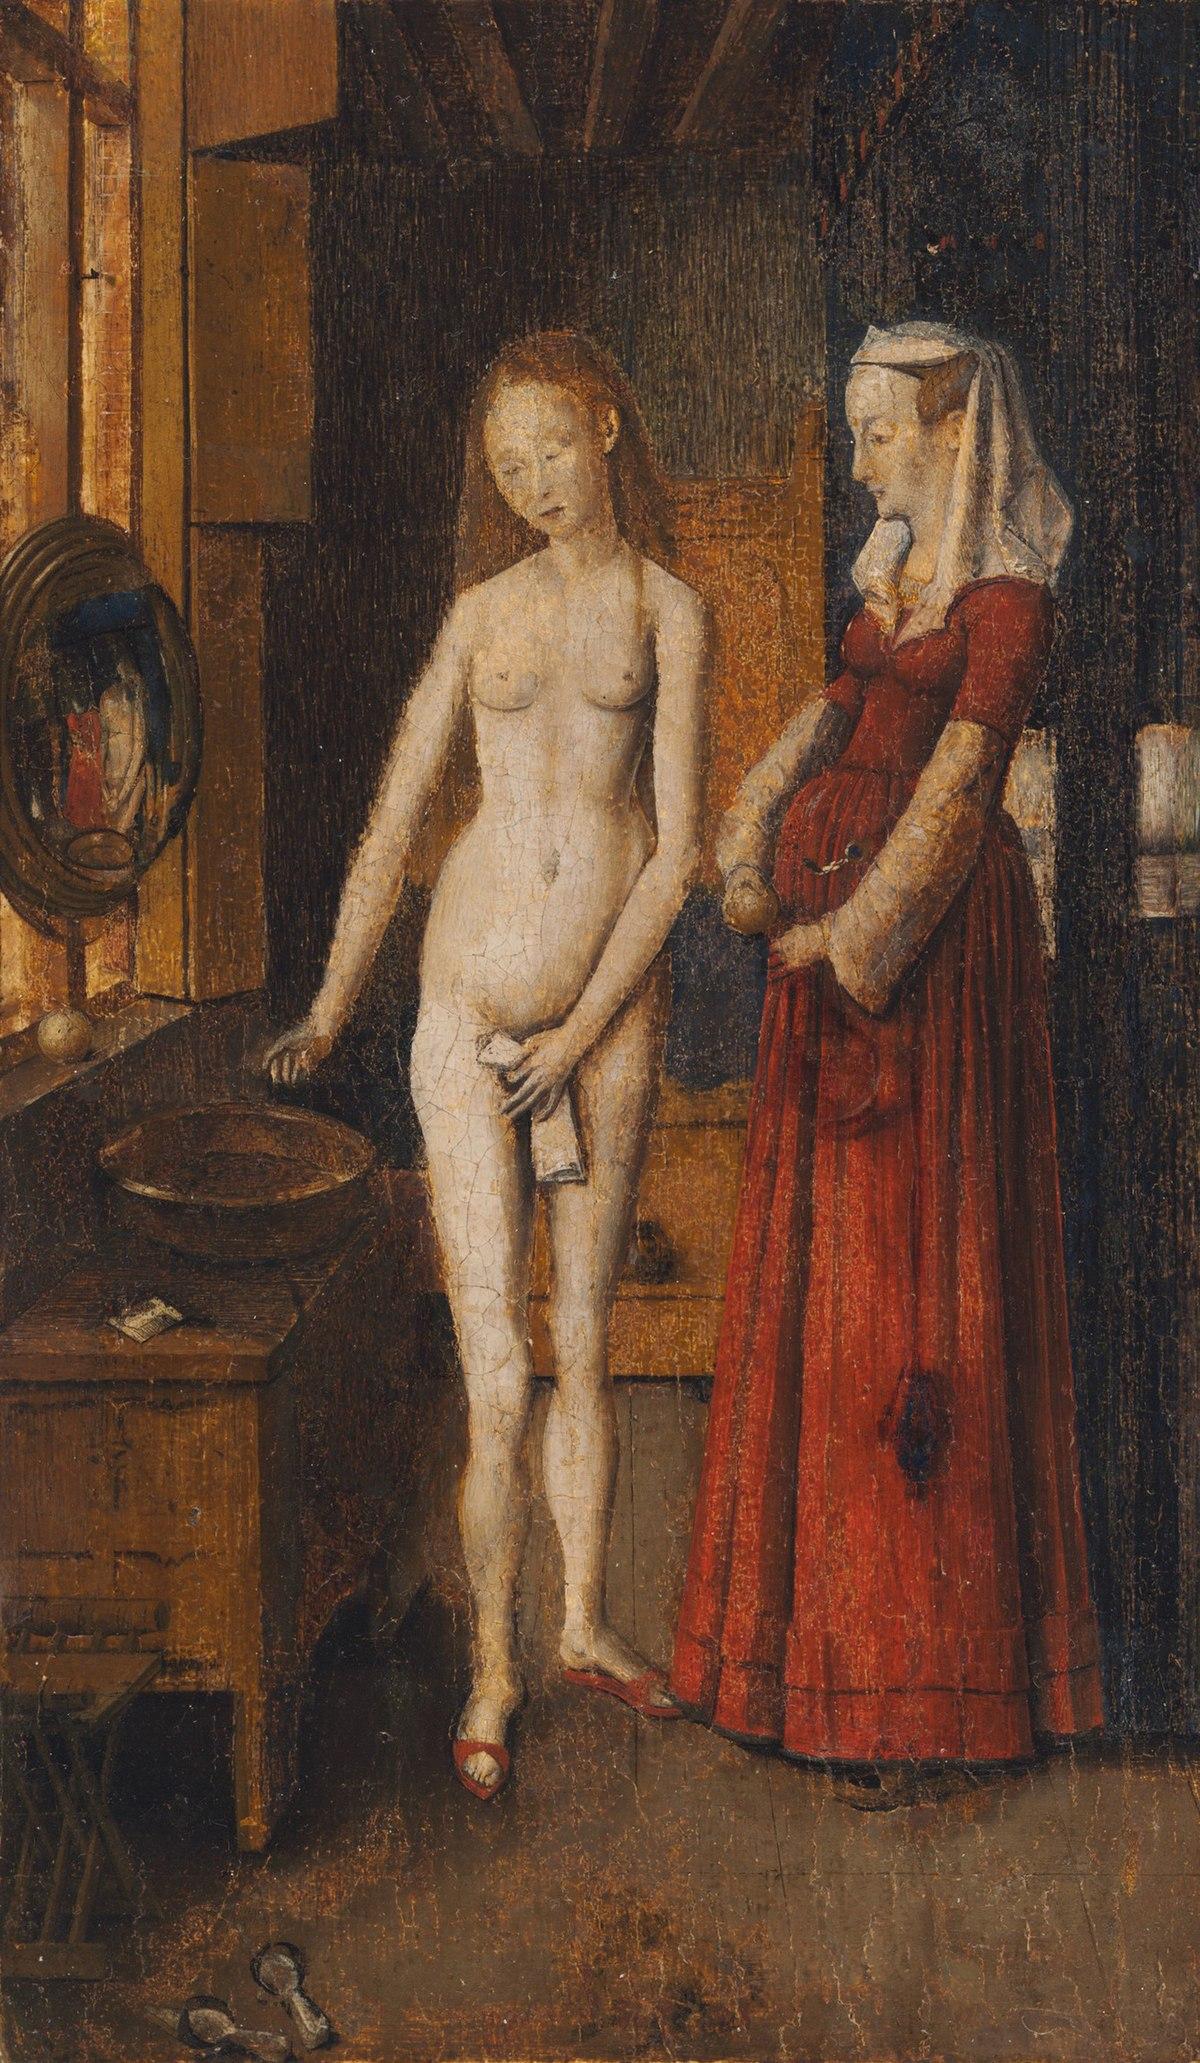 Woman Bathing (van Eyck) - Wikipedia